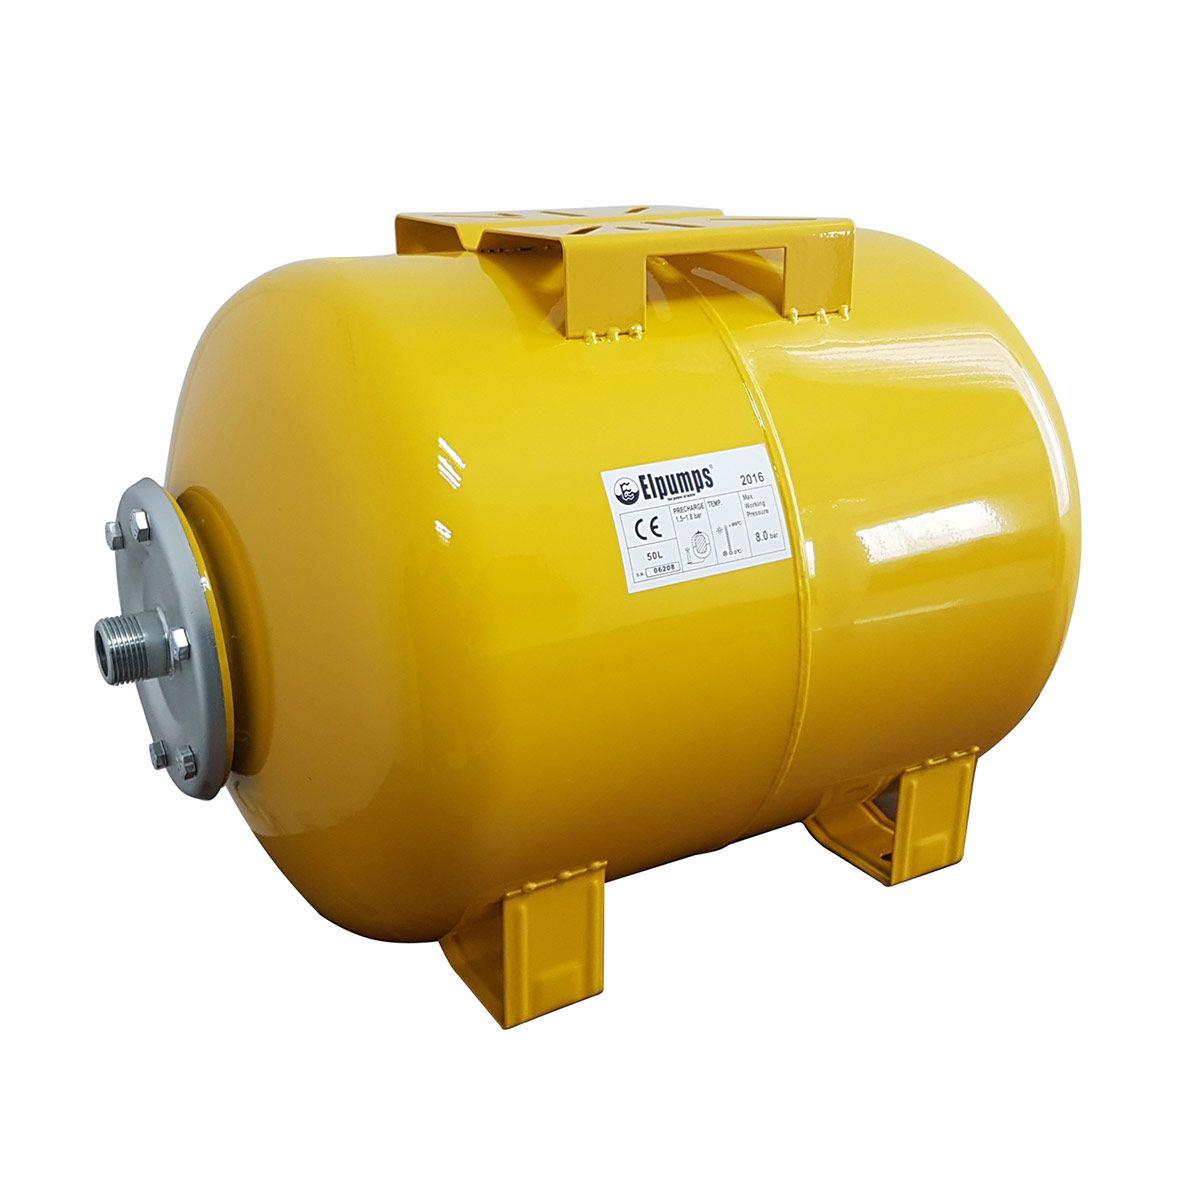 Expansionsgefäss, Stahlblech lackiert, gelb, 50 l, 1' AG